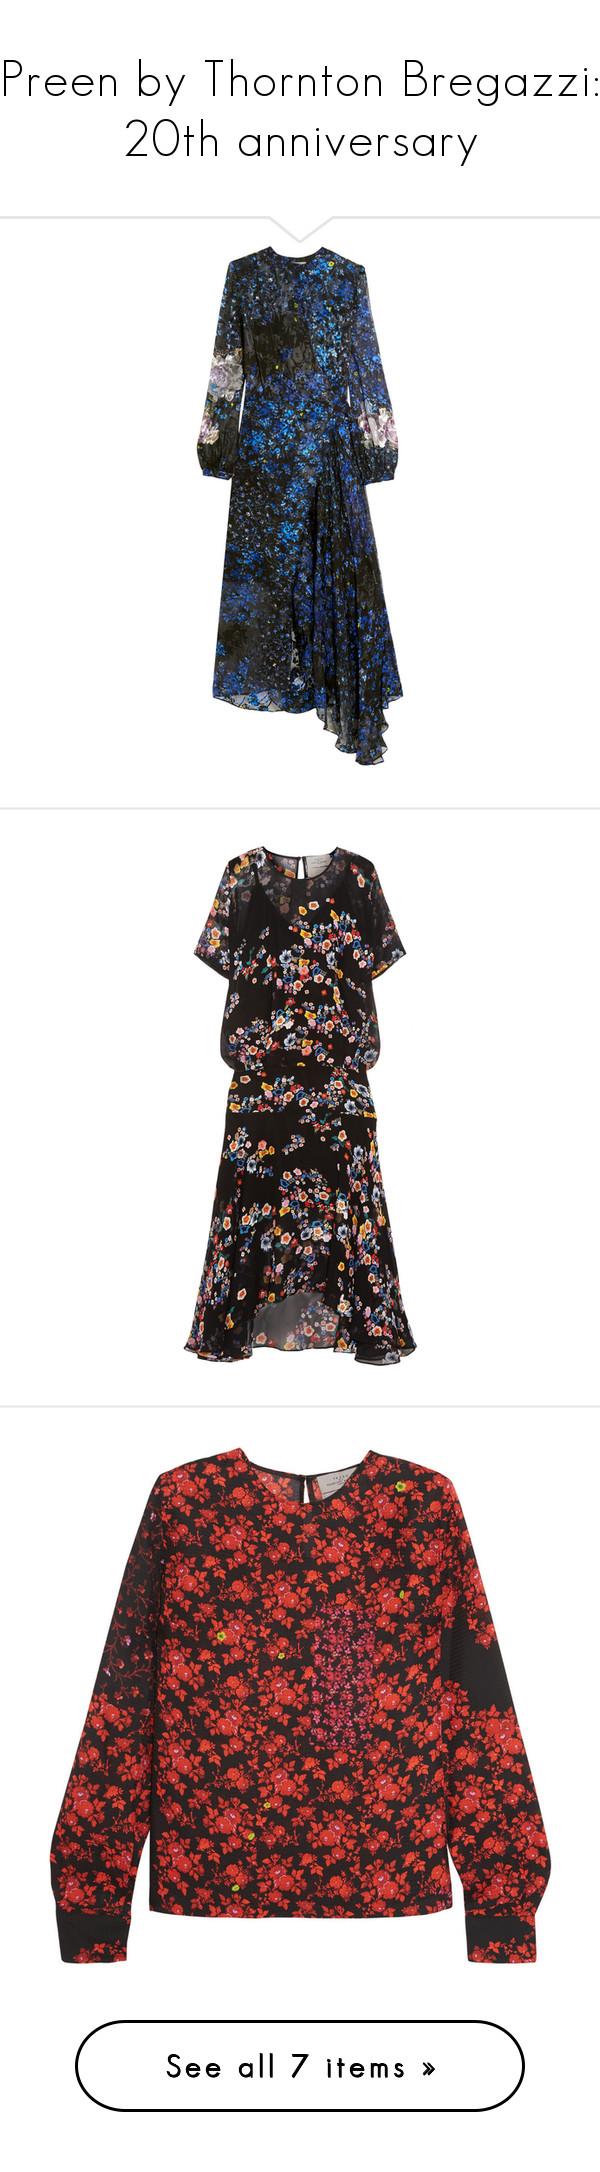 """Preen by Thornton Bregazzi: 20th anniversary"" by livnd ❤ liked on Polyvore featuring preenbythorntonbregazzi, dresses, preen, cobalt blue, silk chiffon dress, wrap dress, wrap tie dress, floral dresses, flower printed dress and dresses 3"